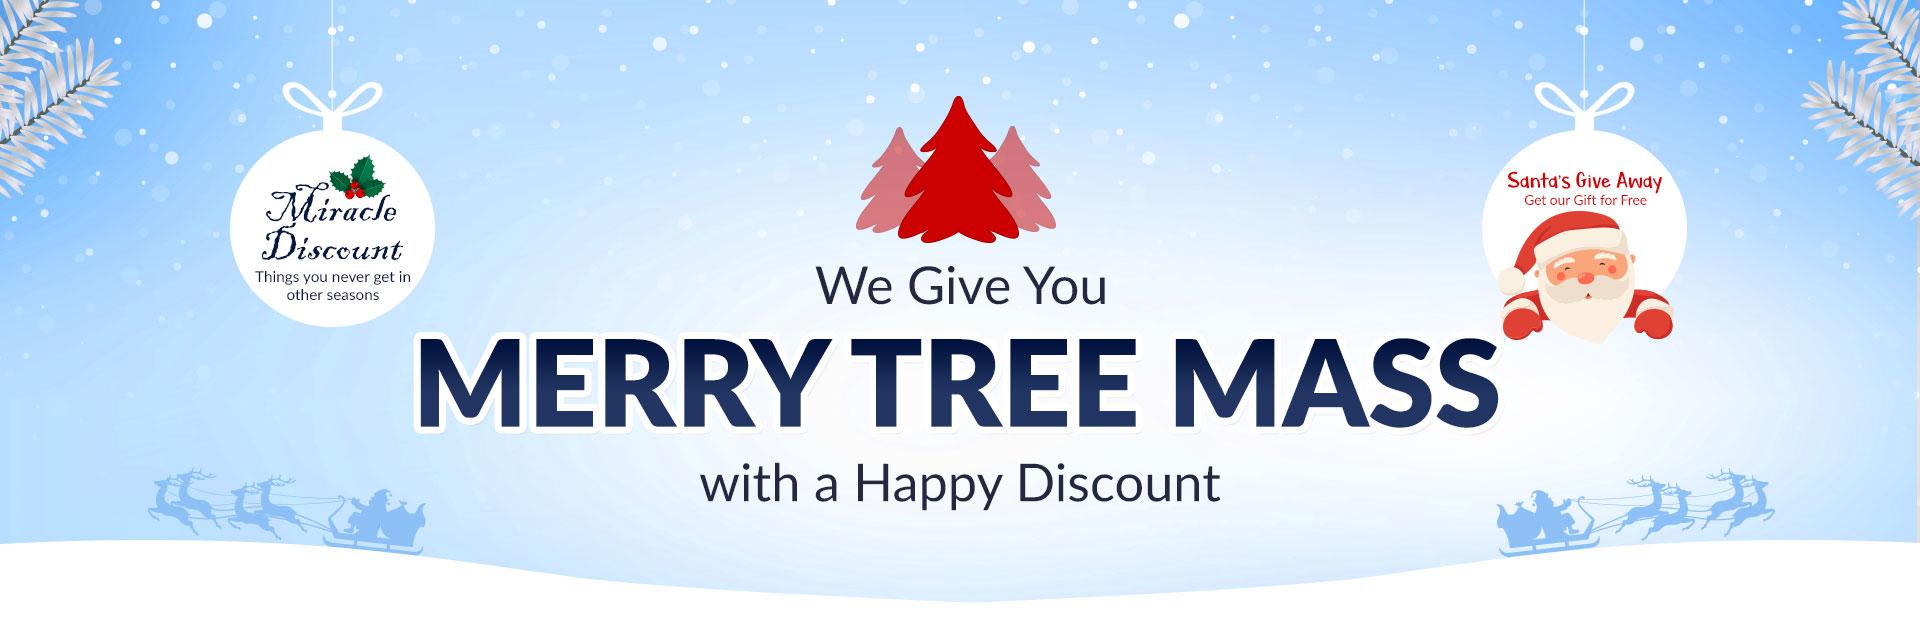 Merry Tree Mass